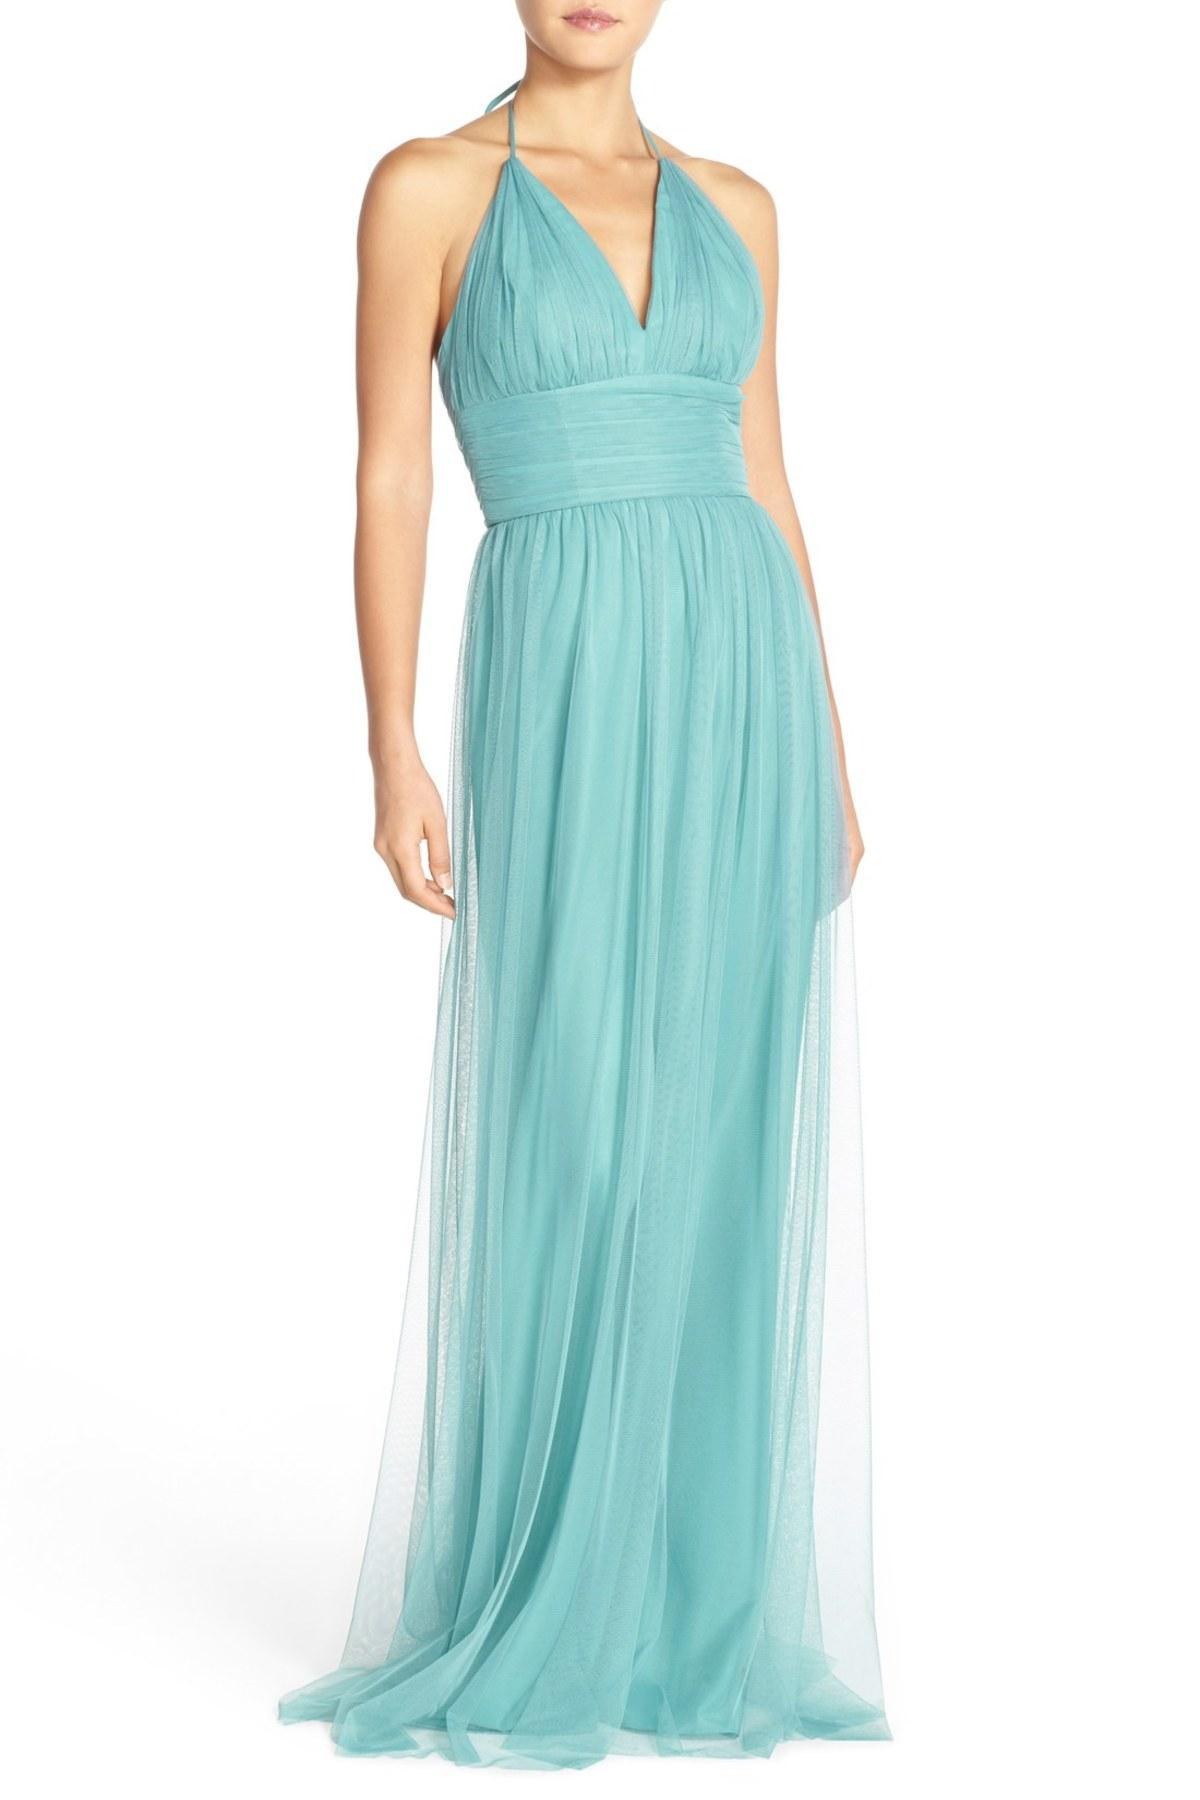 Lyst - Amsale \'astrid\' Tulle Empire Waist Halter Gown in Blue